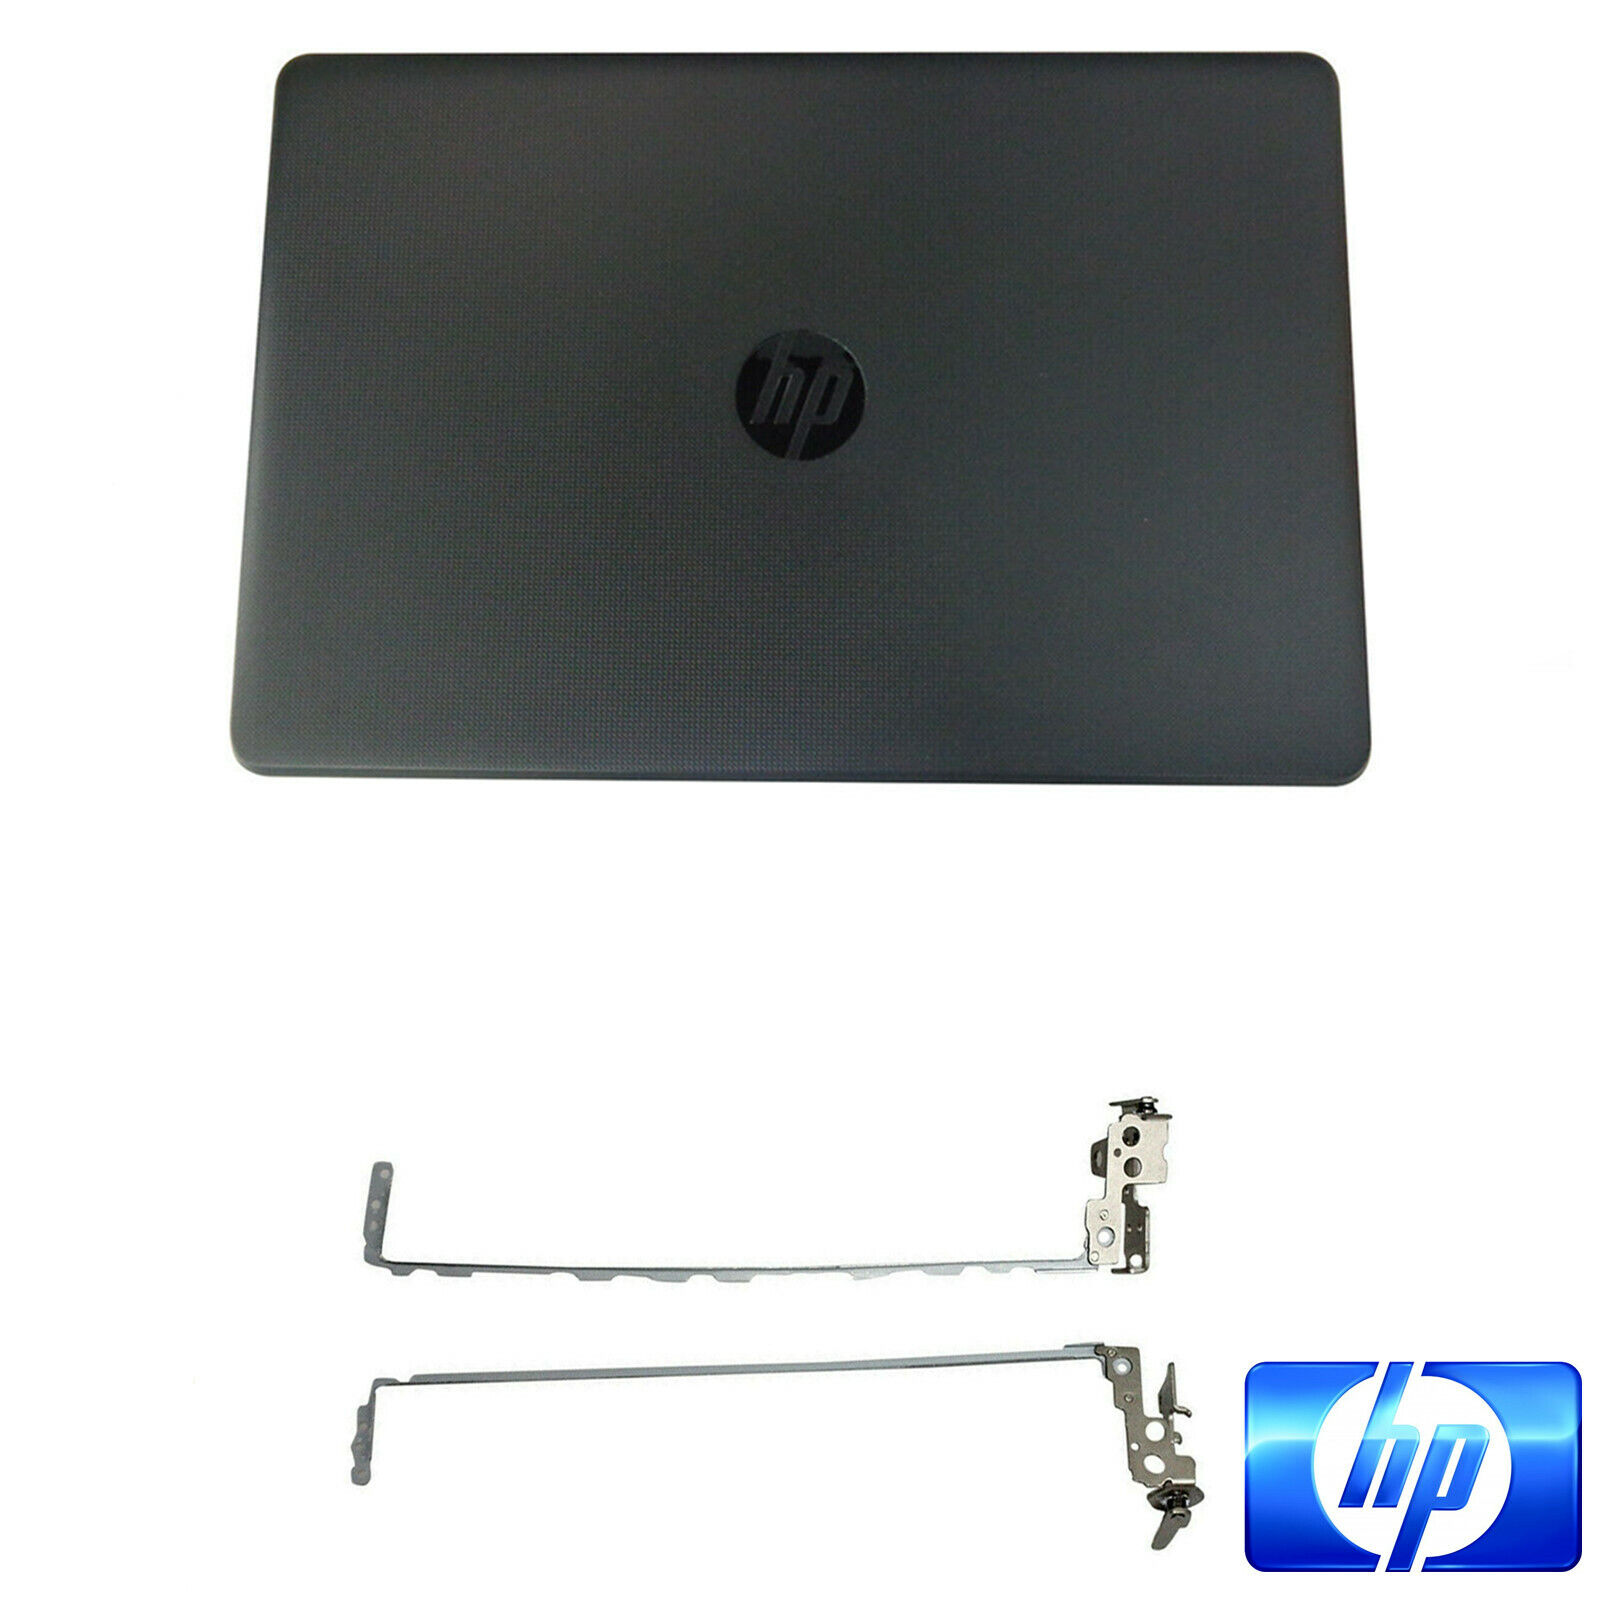 New HP  15-BS 15T-BR 15Q-BU 15T-BS 15-BW 250 255 G6  Lcd Back Cover 924899-001